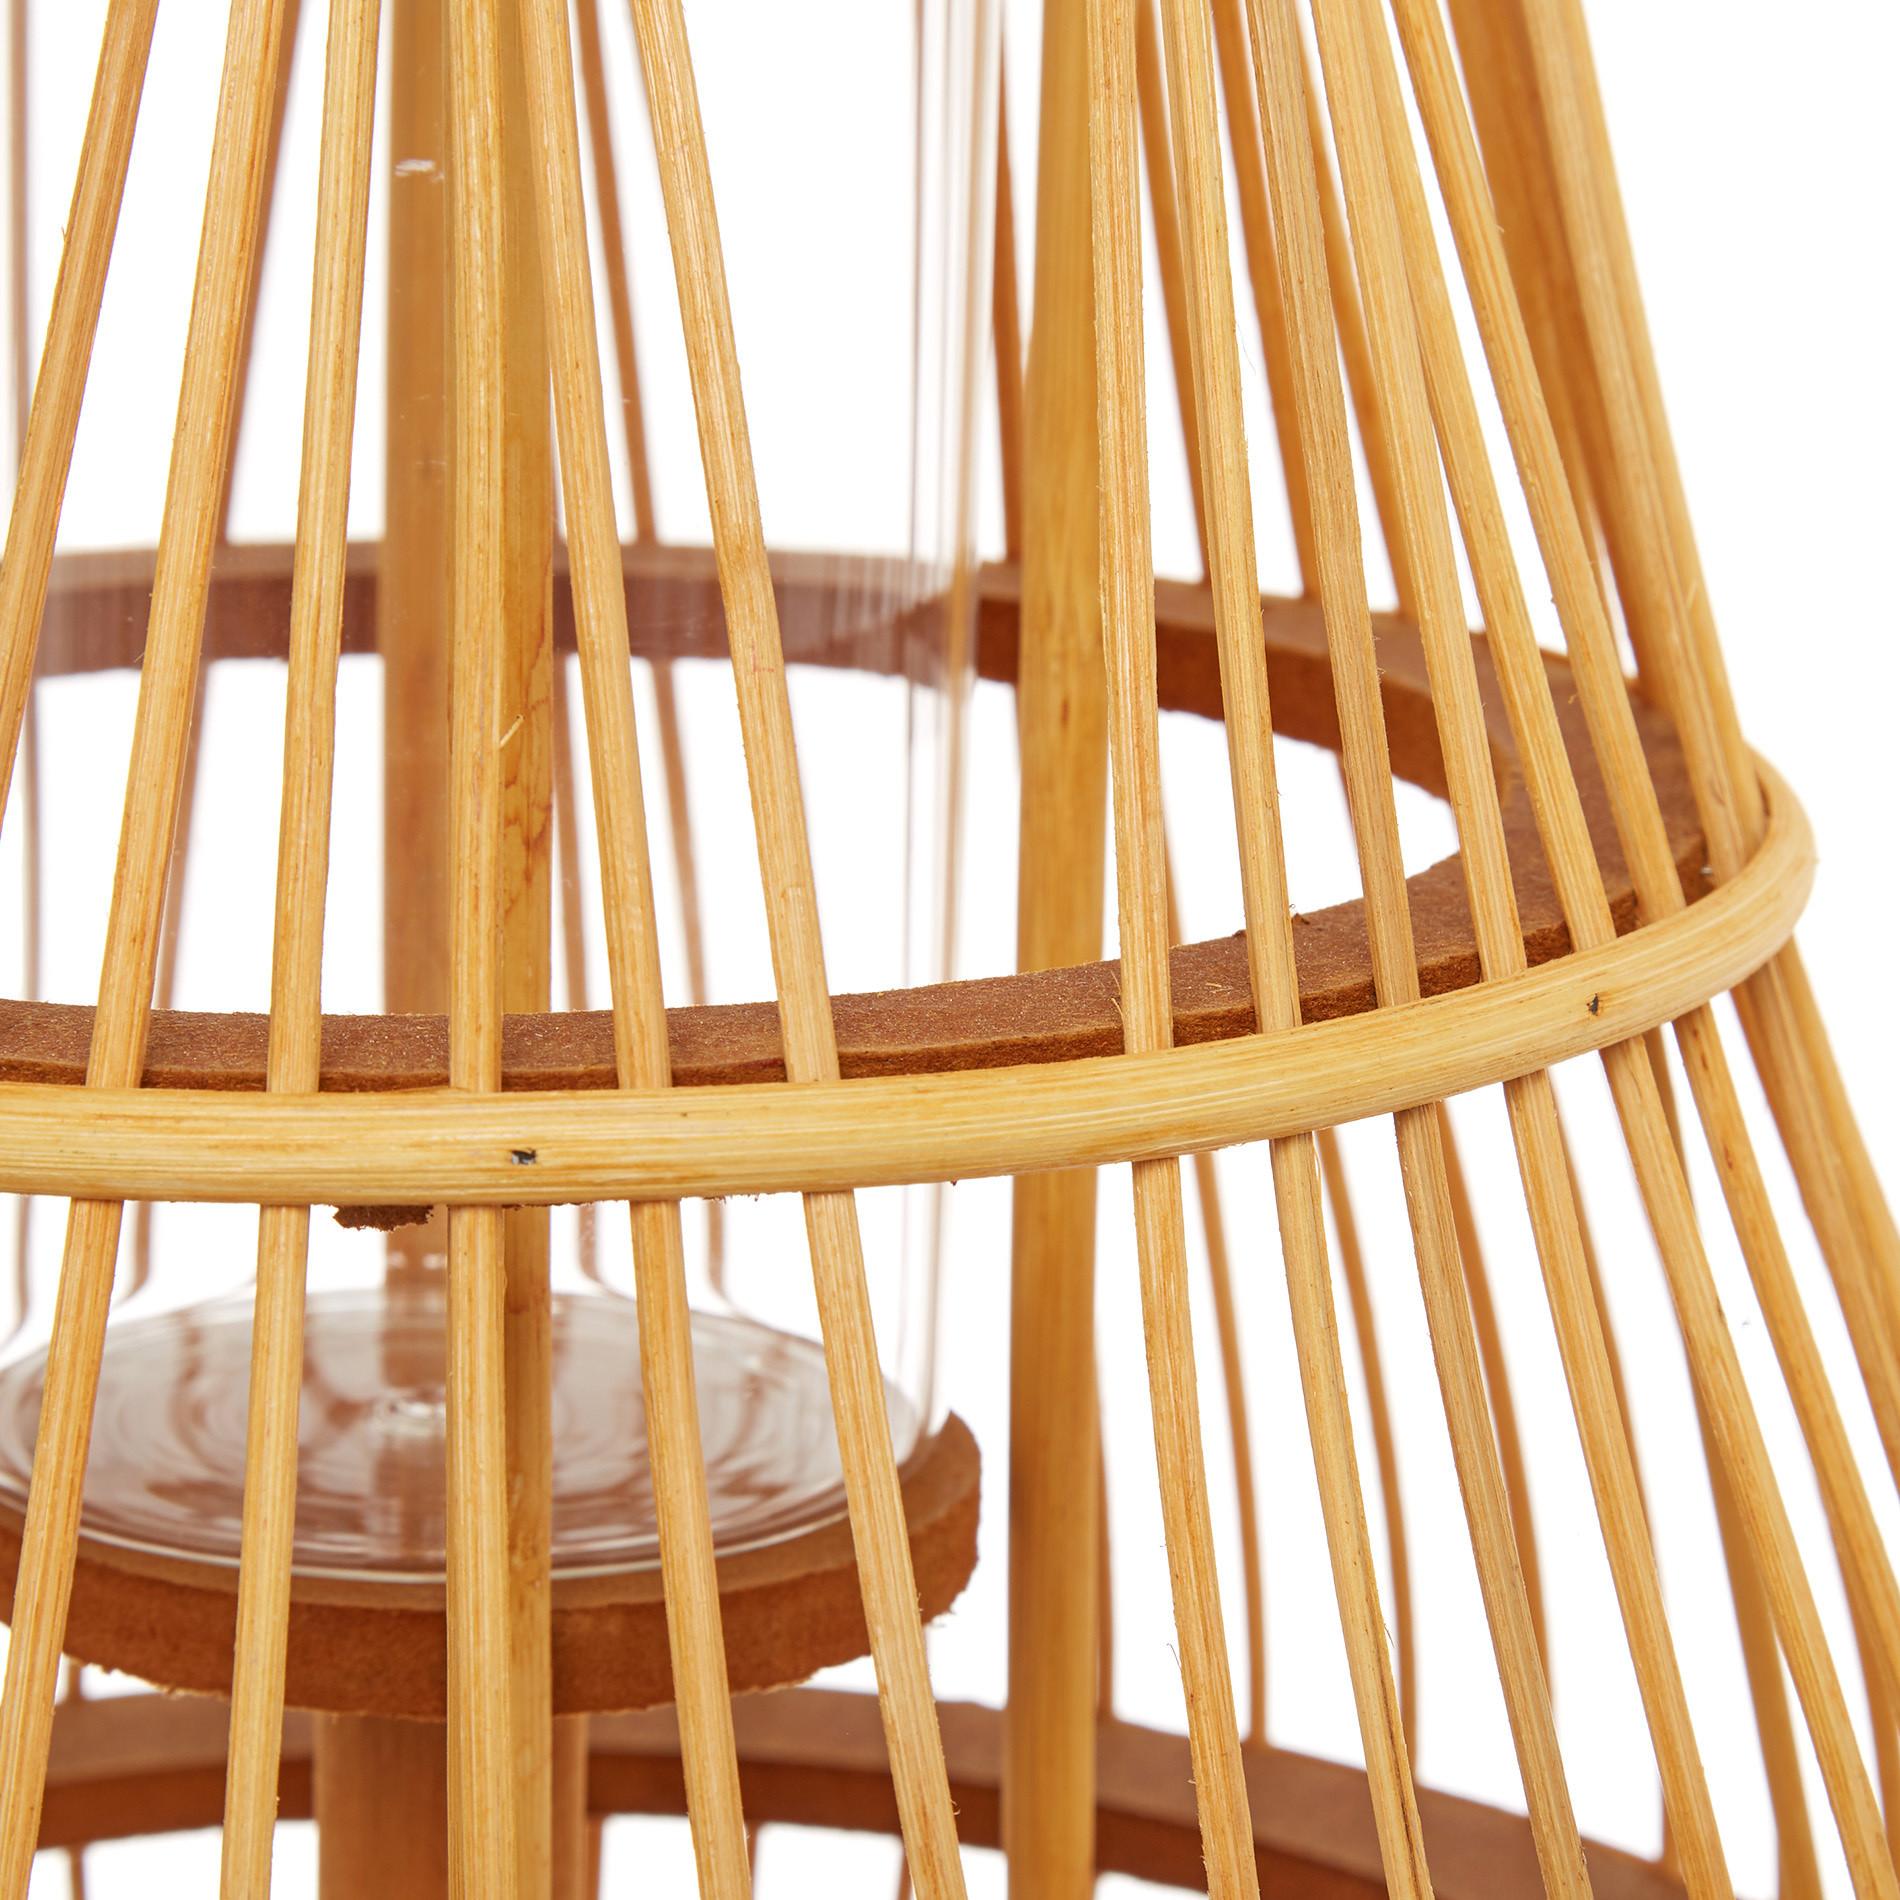 Lanterna bamboo intrecciato a mano, Trasparente, large image number 1